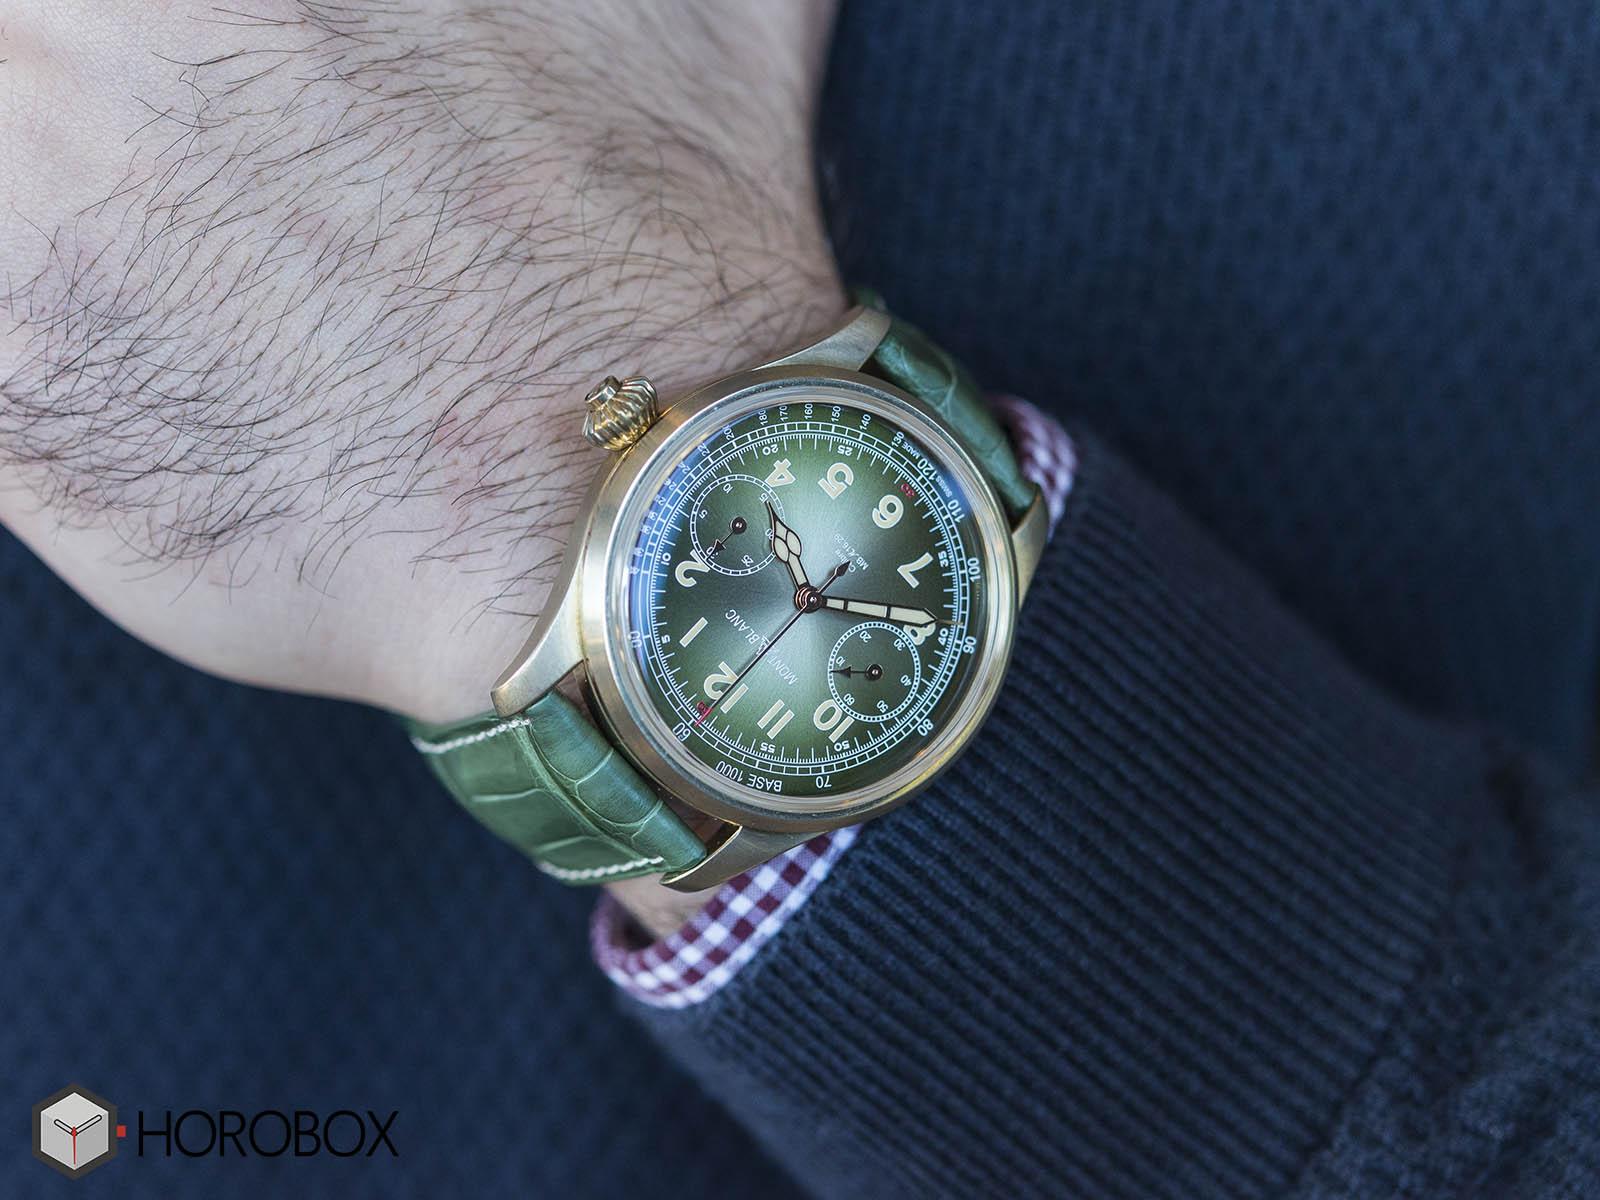 montblanc-1858-chronograph-onlywatch-bronzo-3.jpg